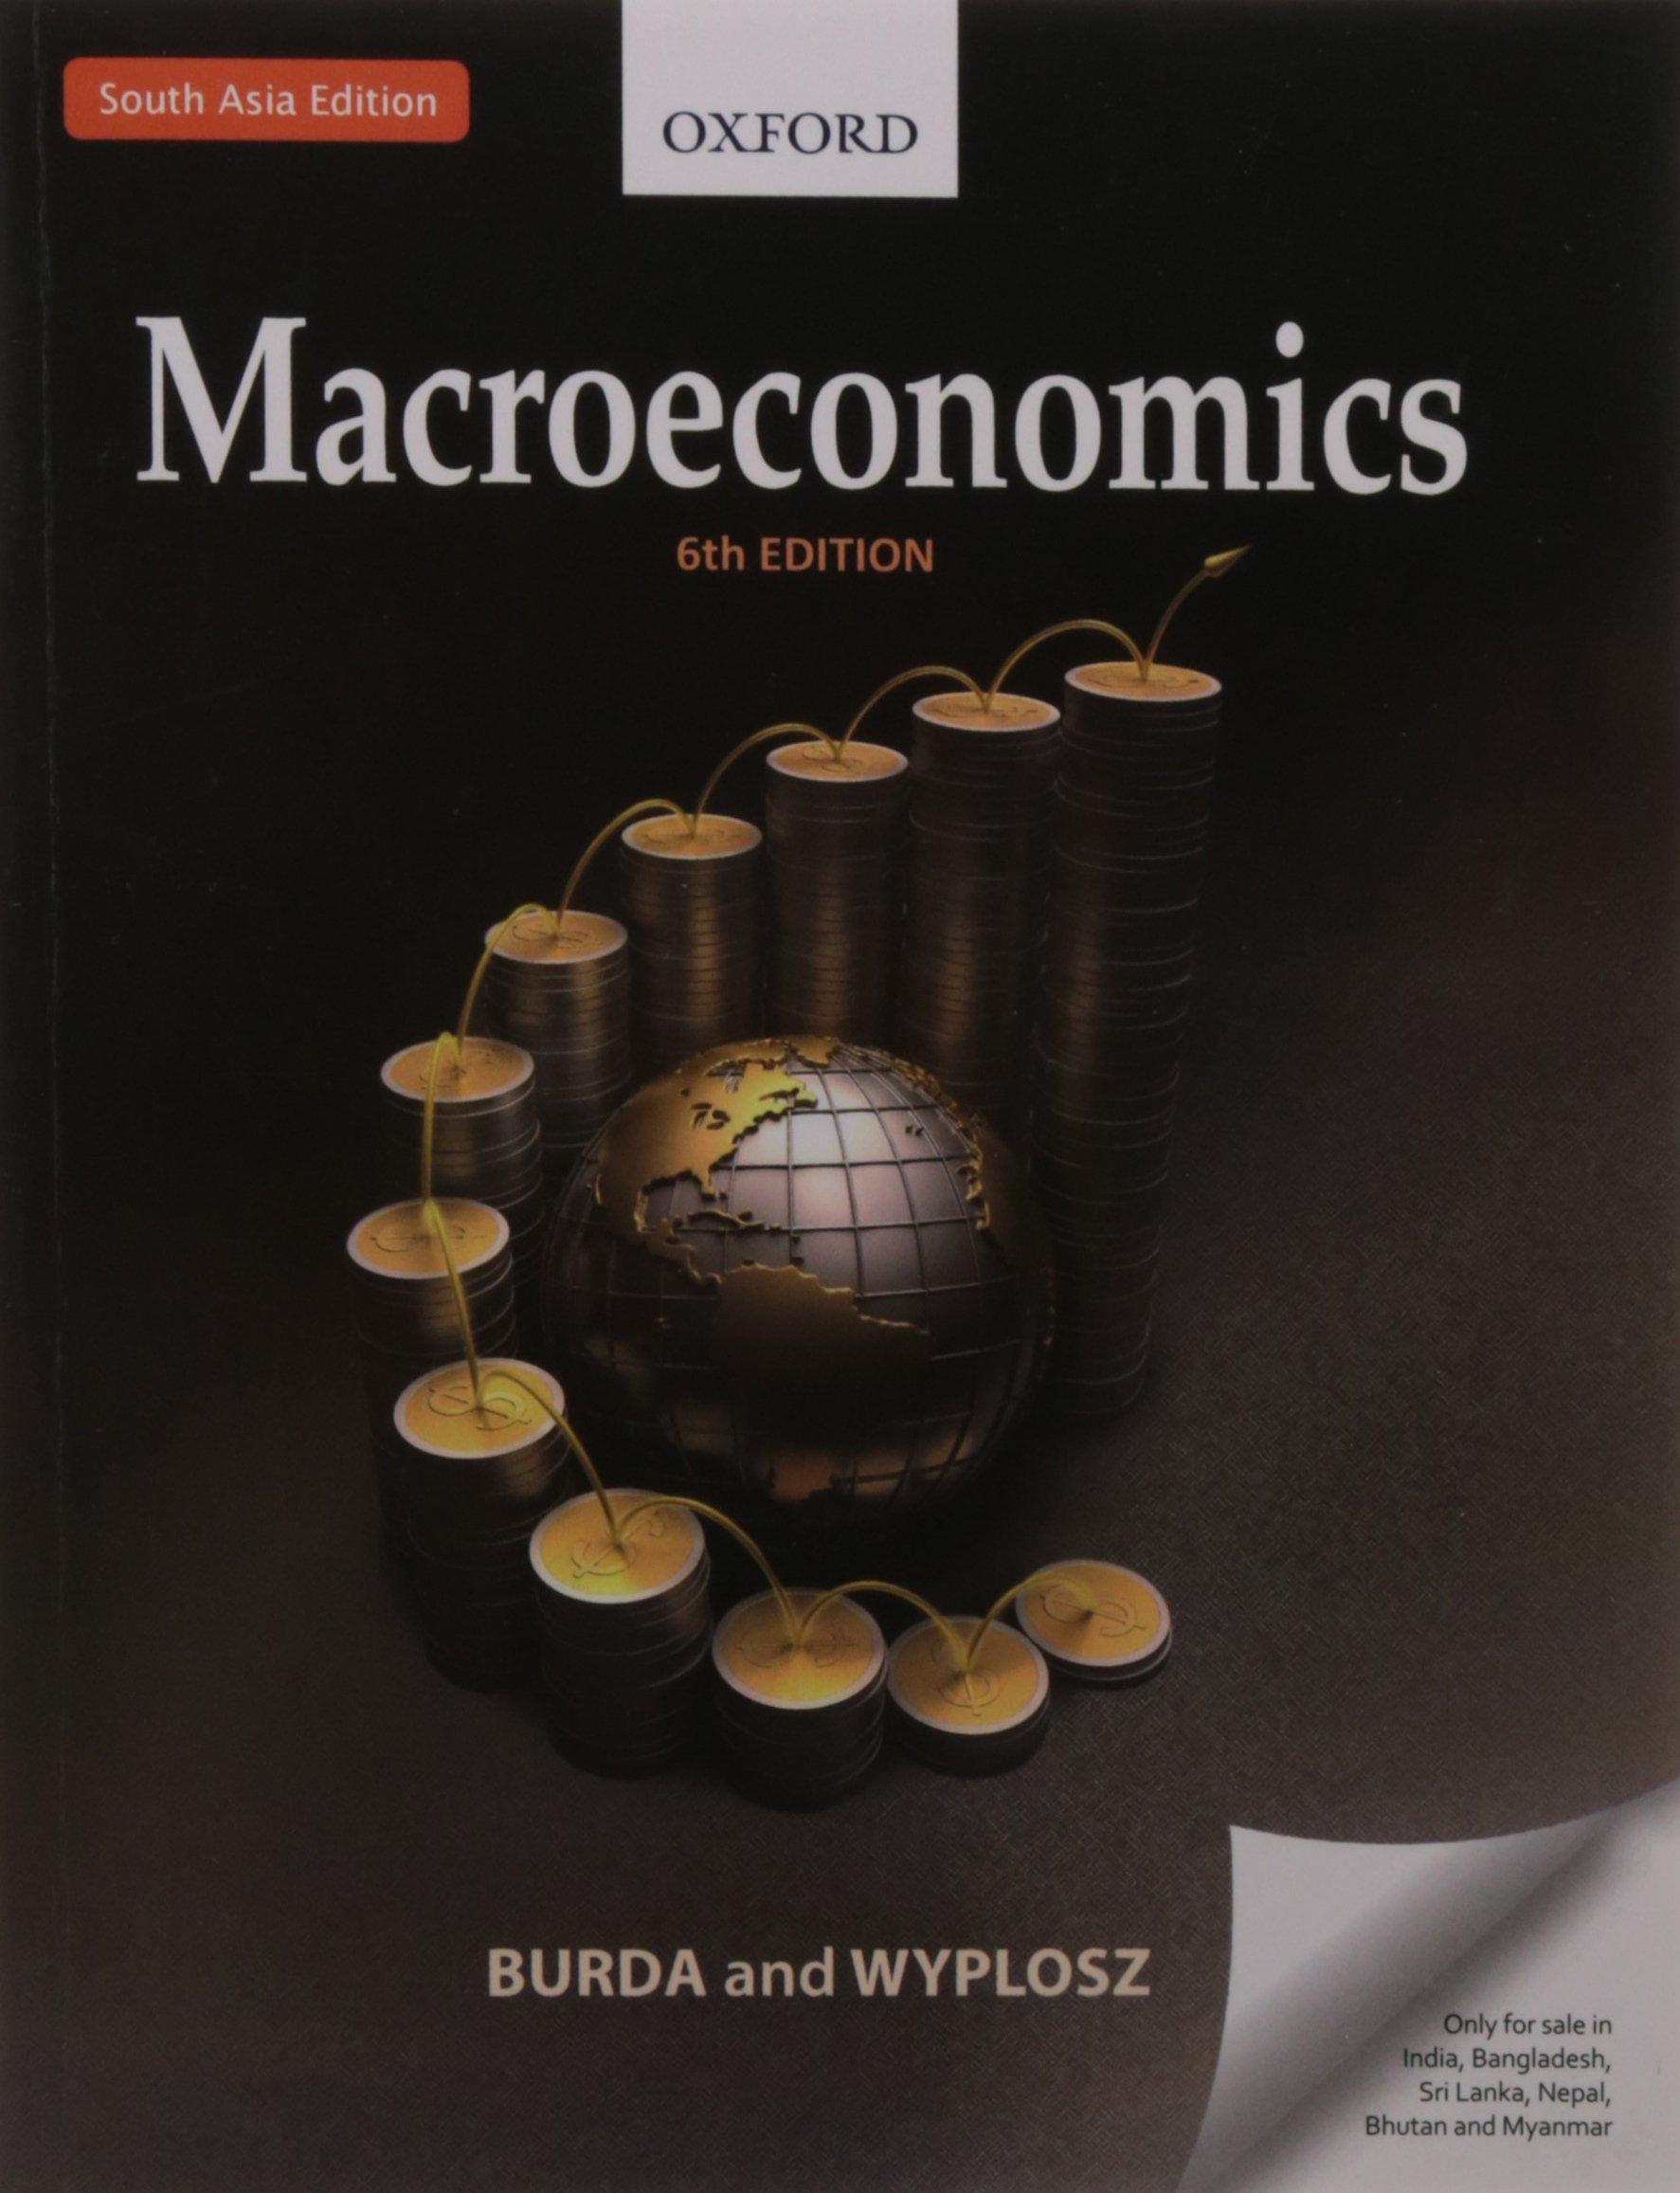 BURDA & WYPLOSZ MACROECONOMICS 6E PDF